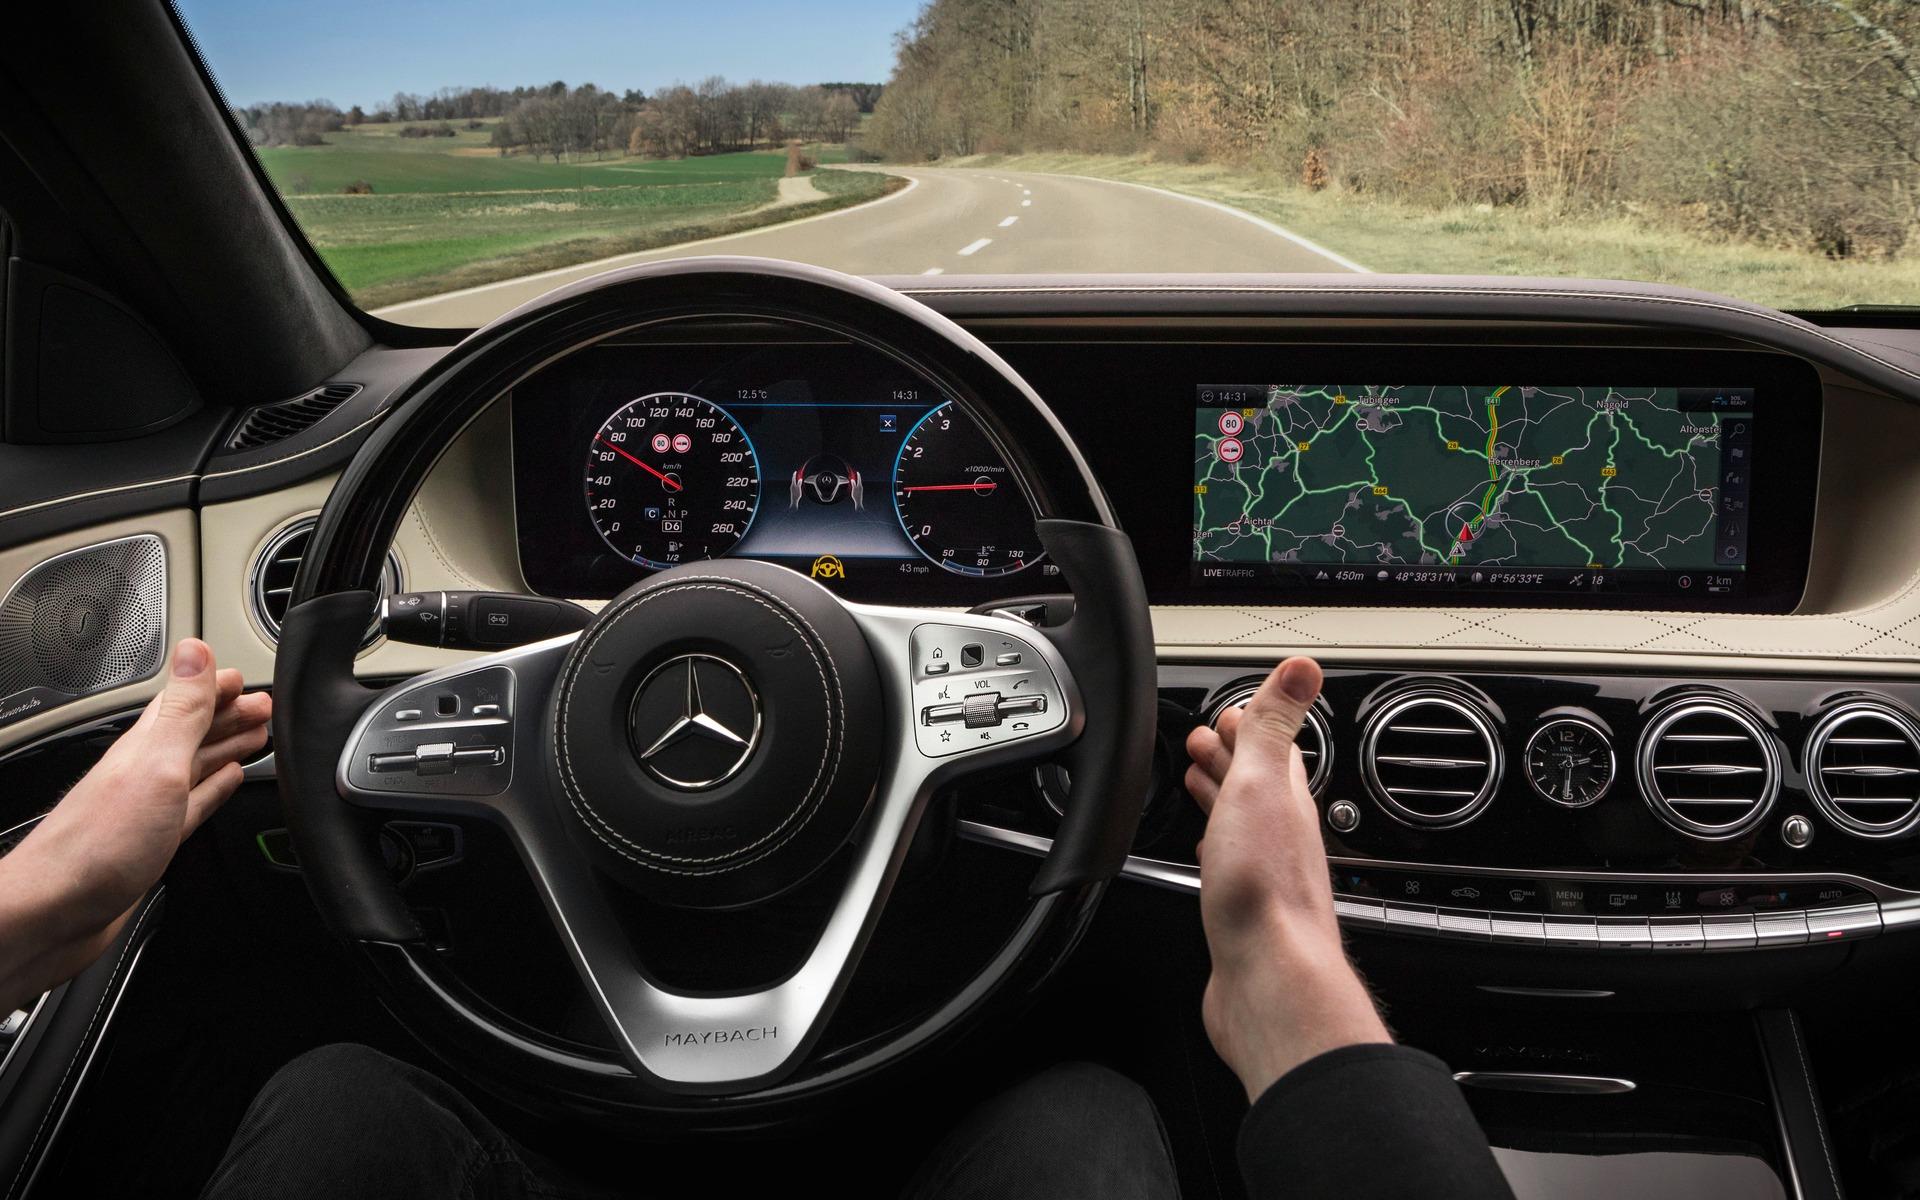 https://i.gaw.to/photos/3/0/2/302133_2018_Mercedes-Benz_S-Class.jpg